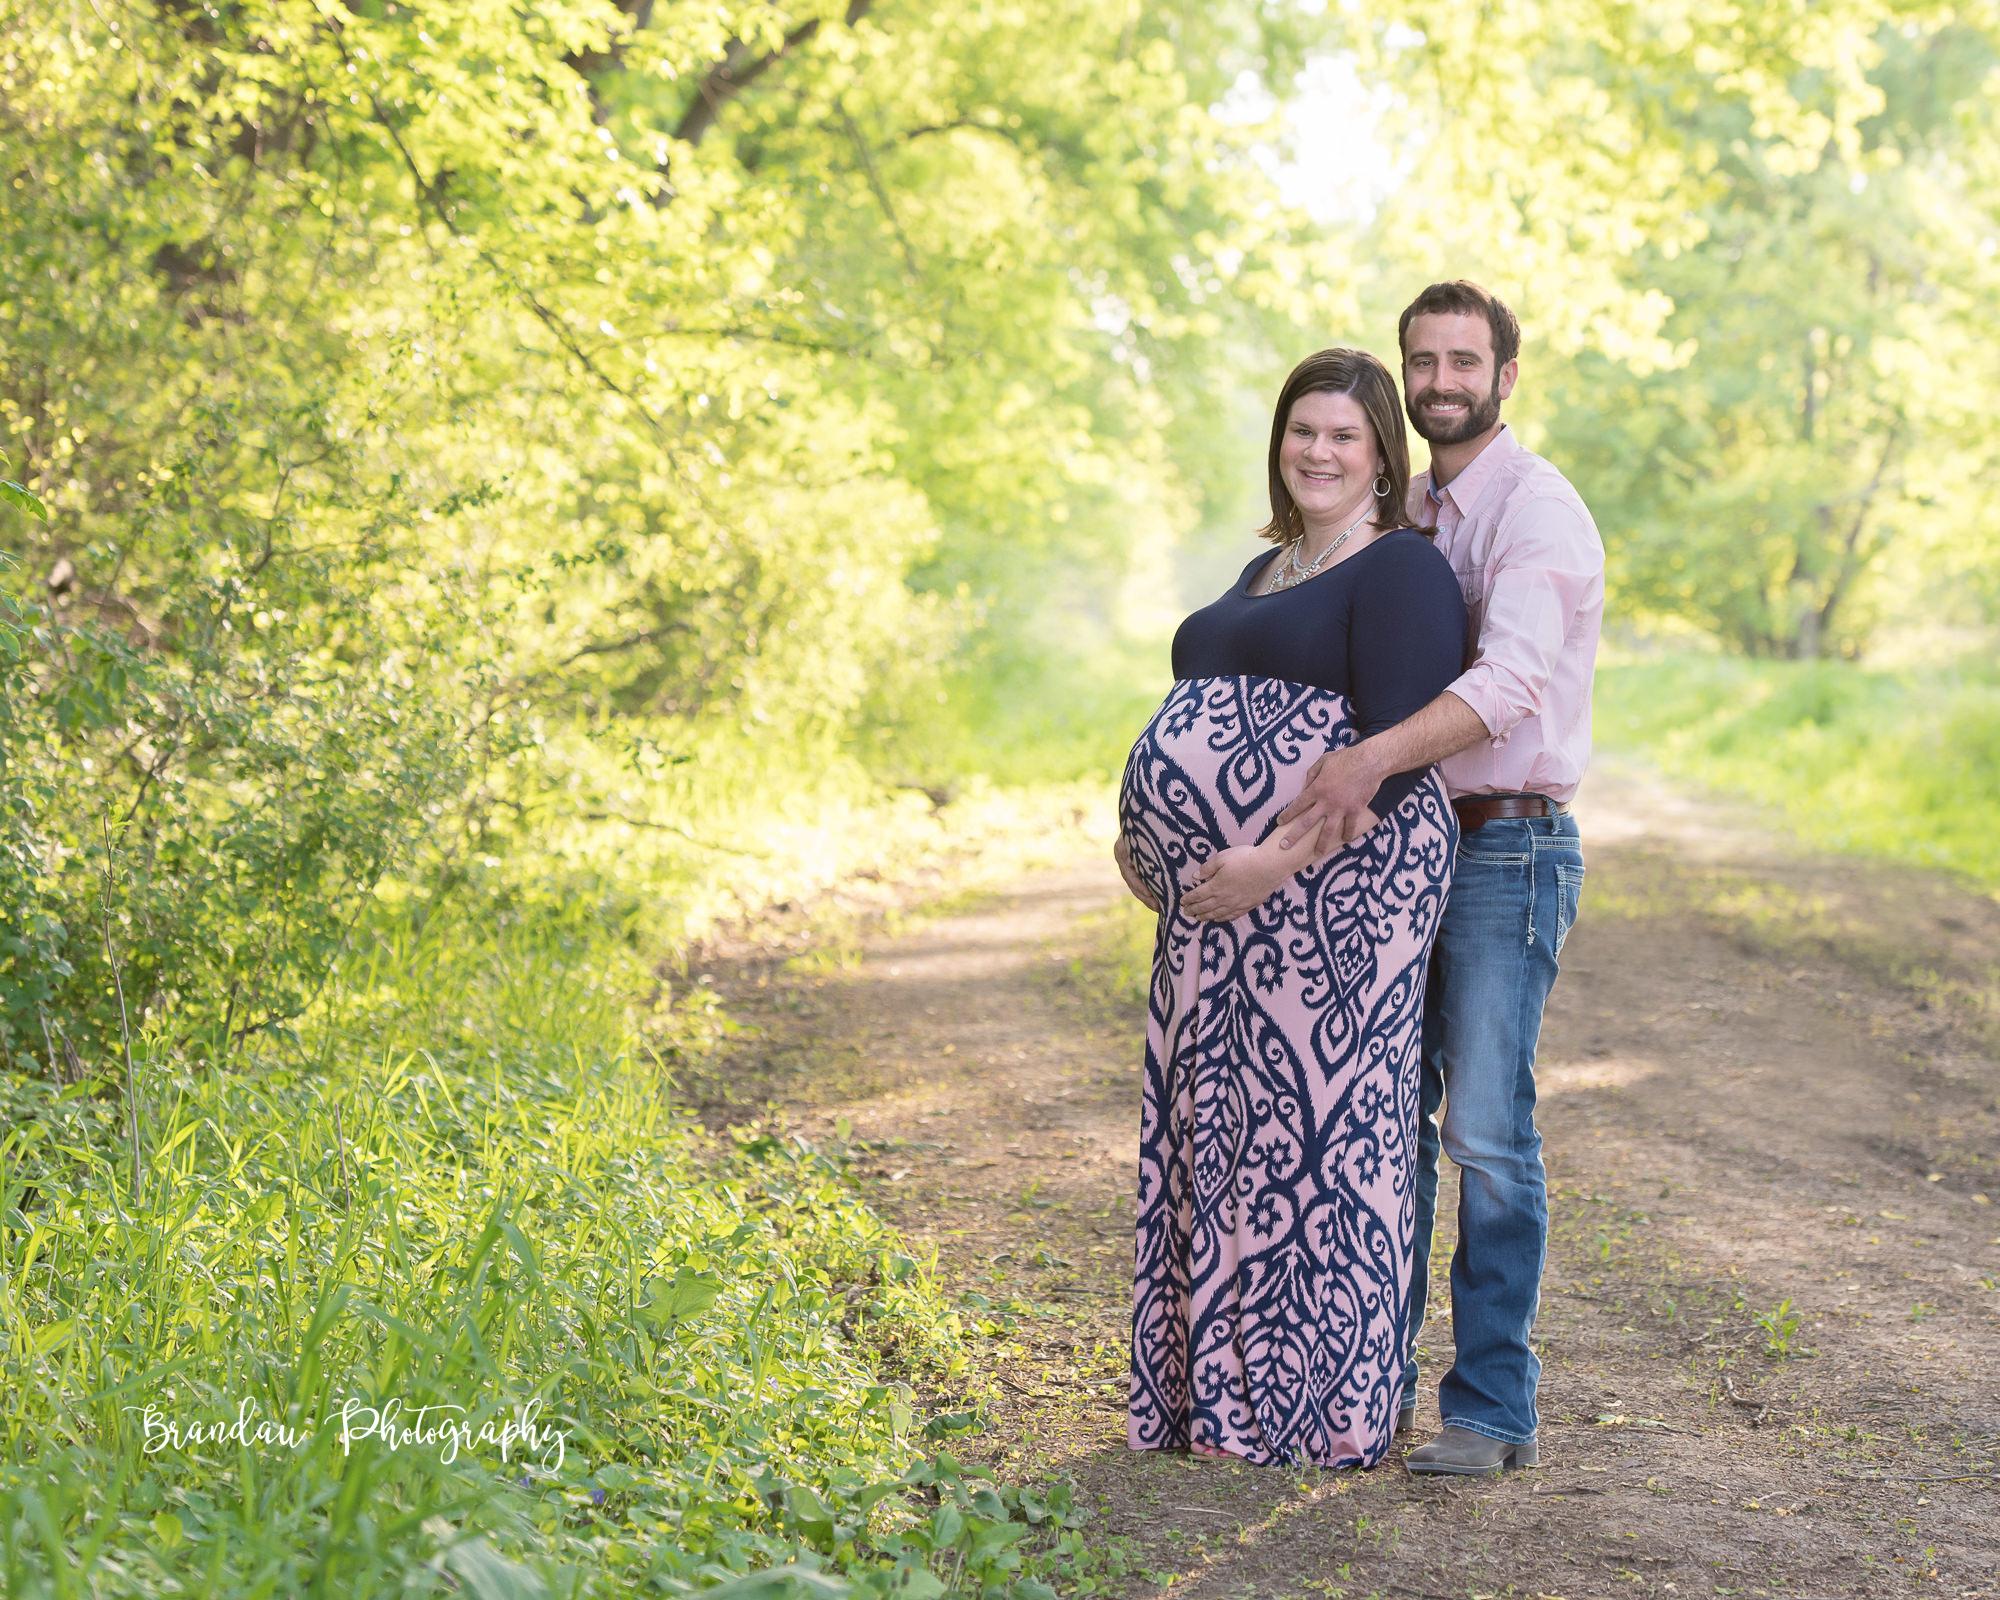 Baby Bump_Couple_Maternity_Brandau Photography-4.jpg